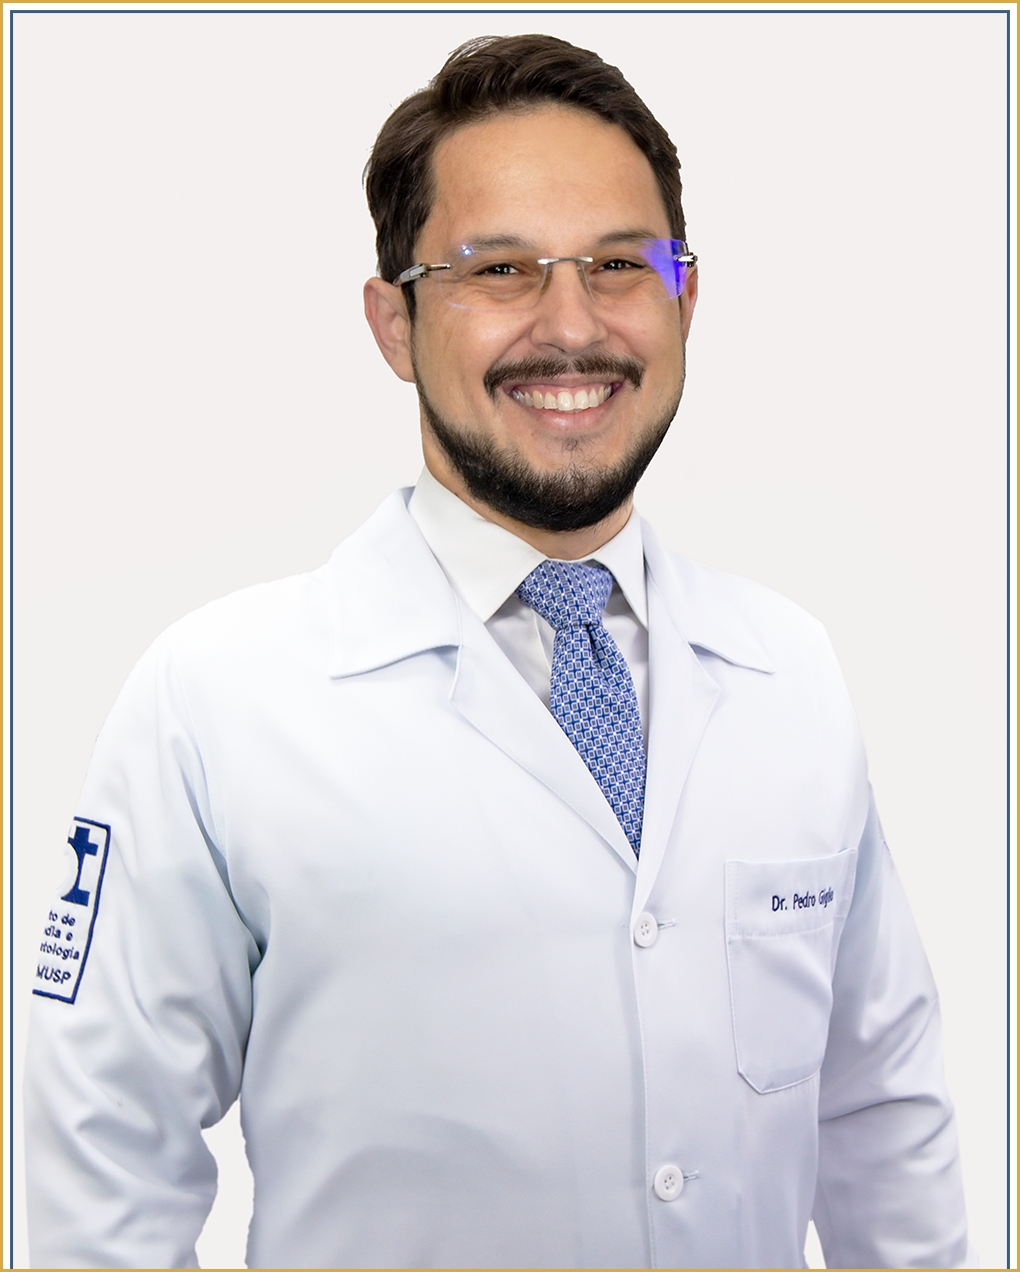 Pedro-Giglio-Ortopedista-Joelho-2